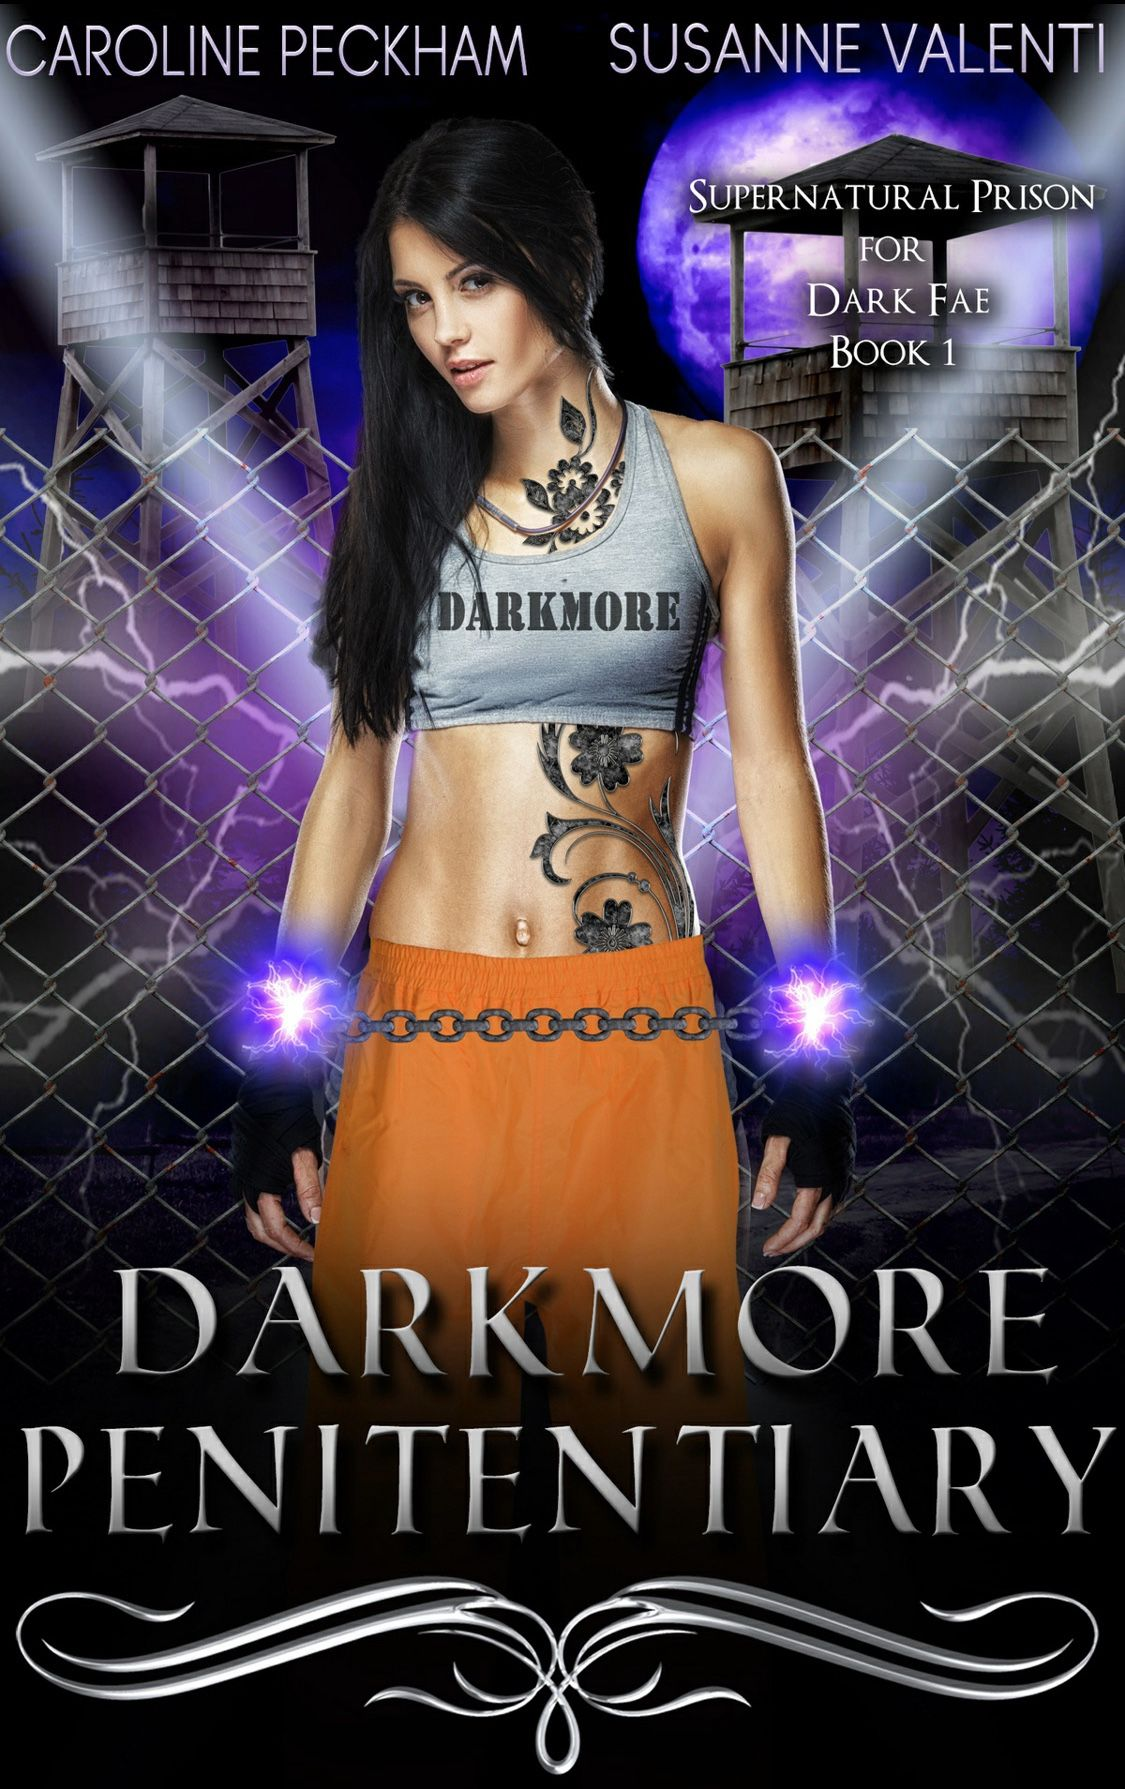 Review Darkmore Penitentiary By Caroline Peckham